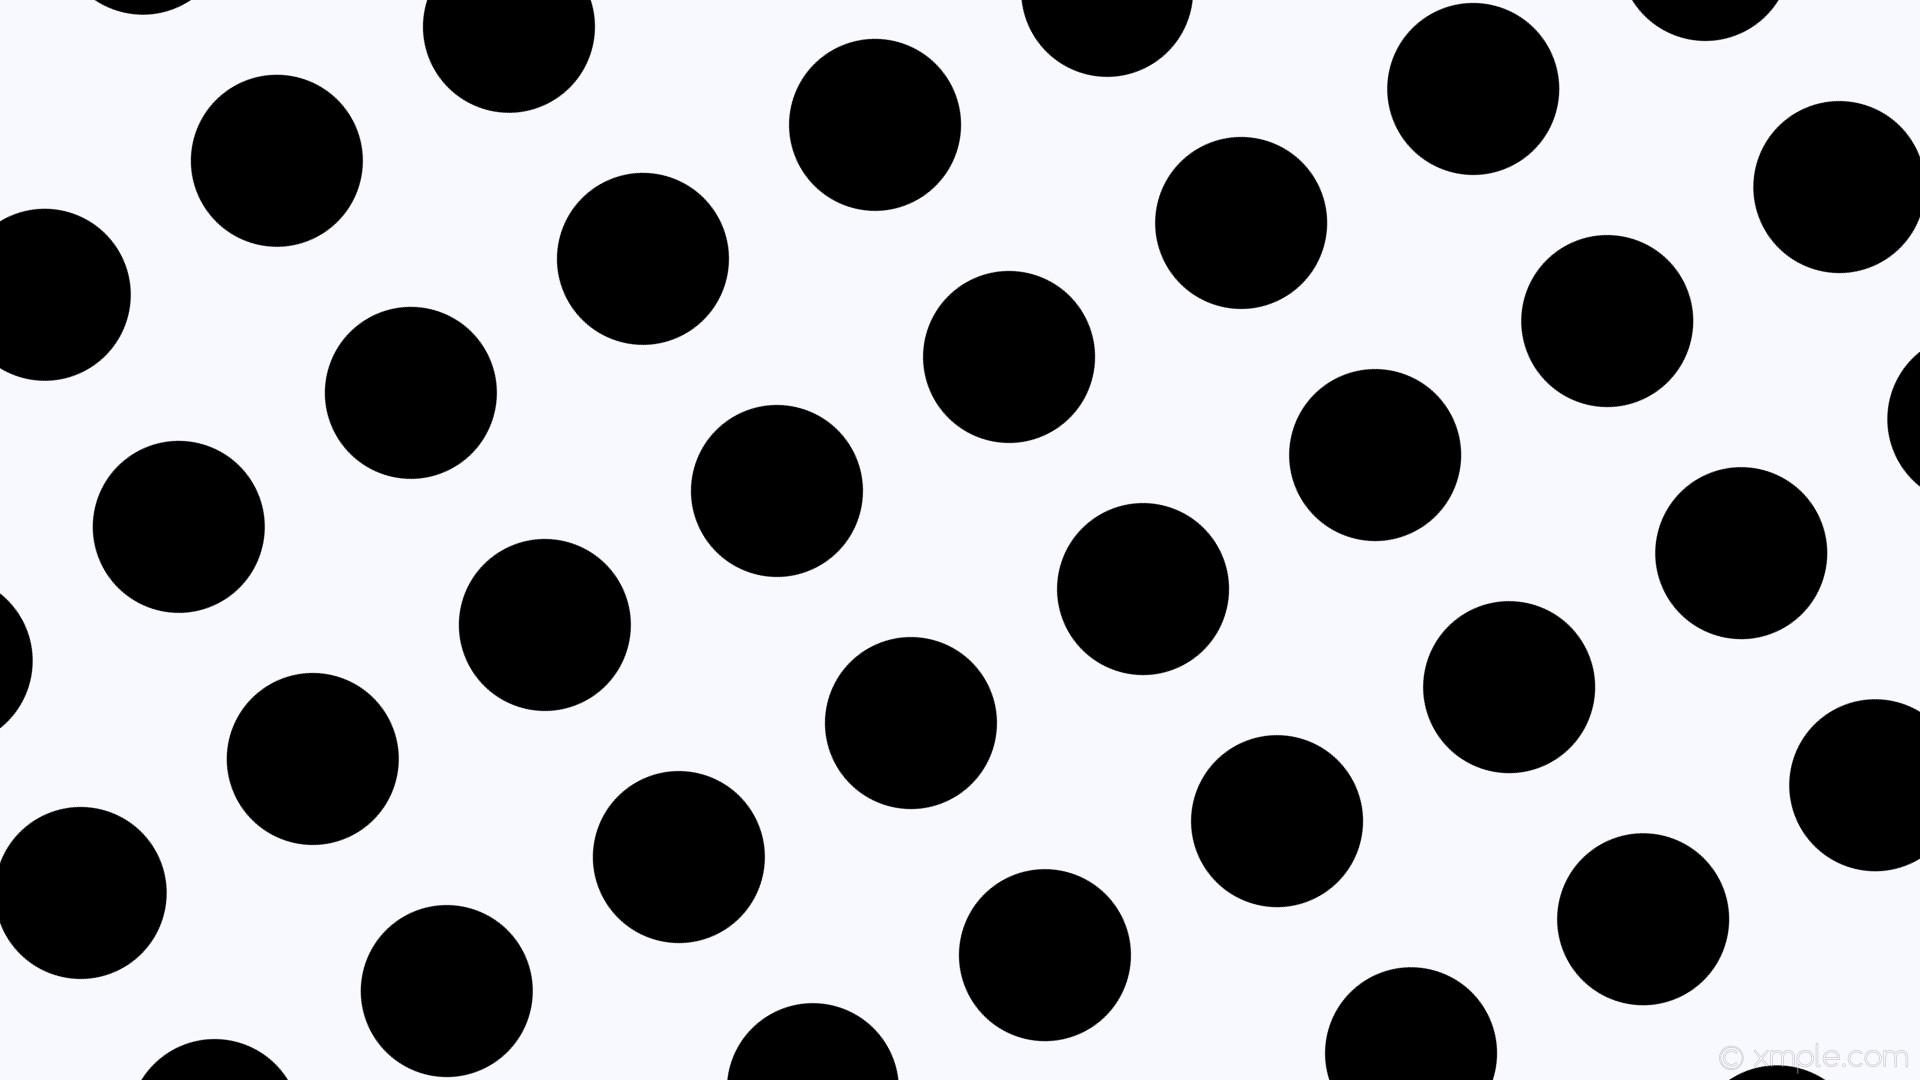 wallpaper dots white polka black spots ghost white #f8f8ff #000000 210°  172px 268px